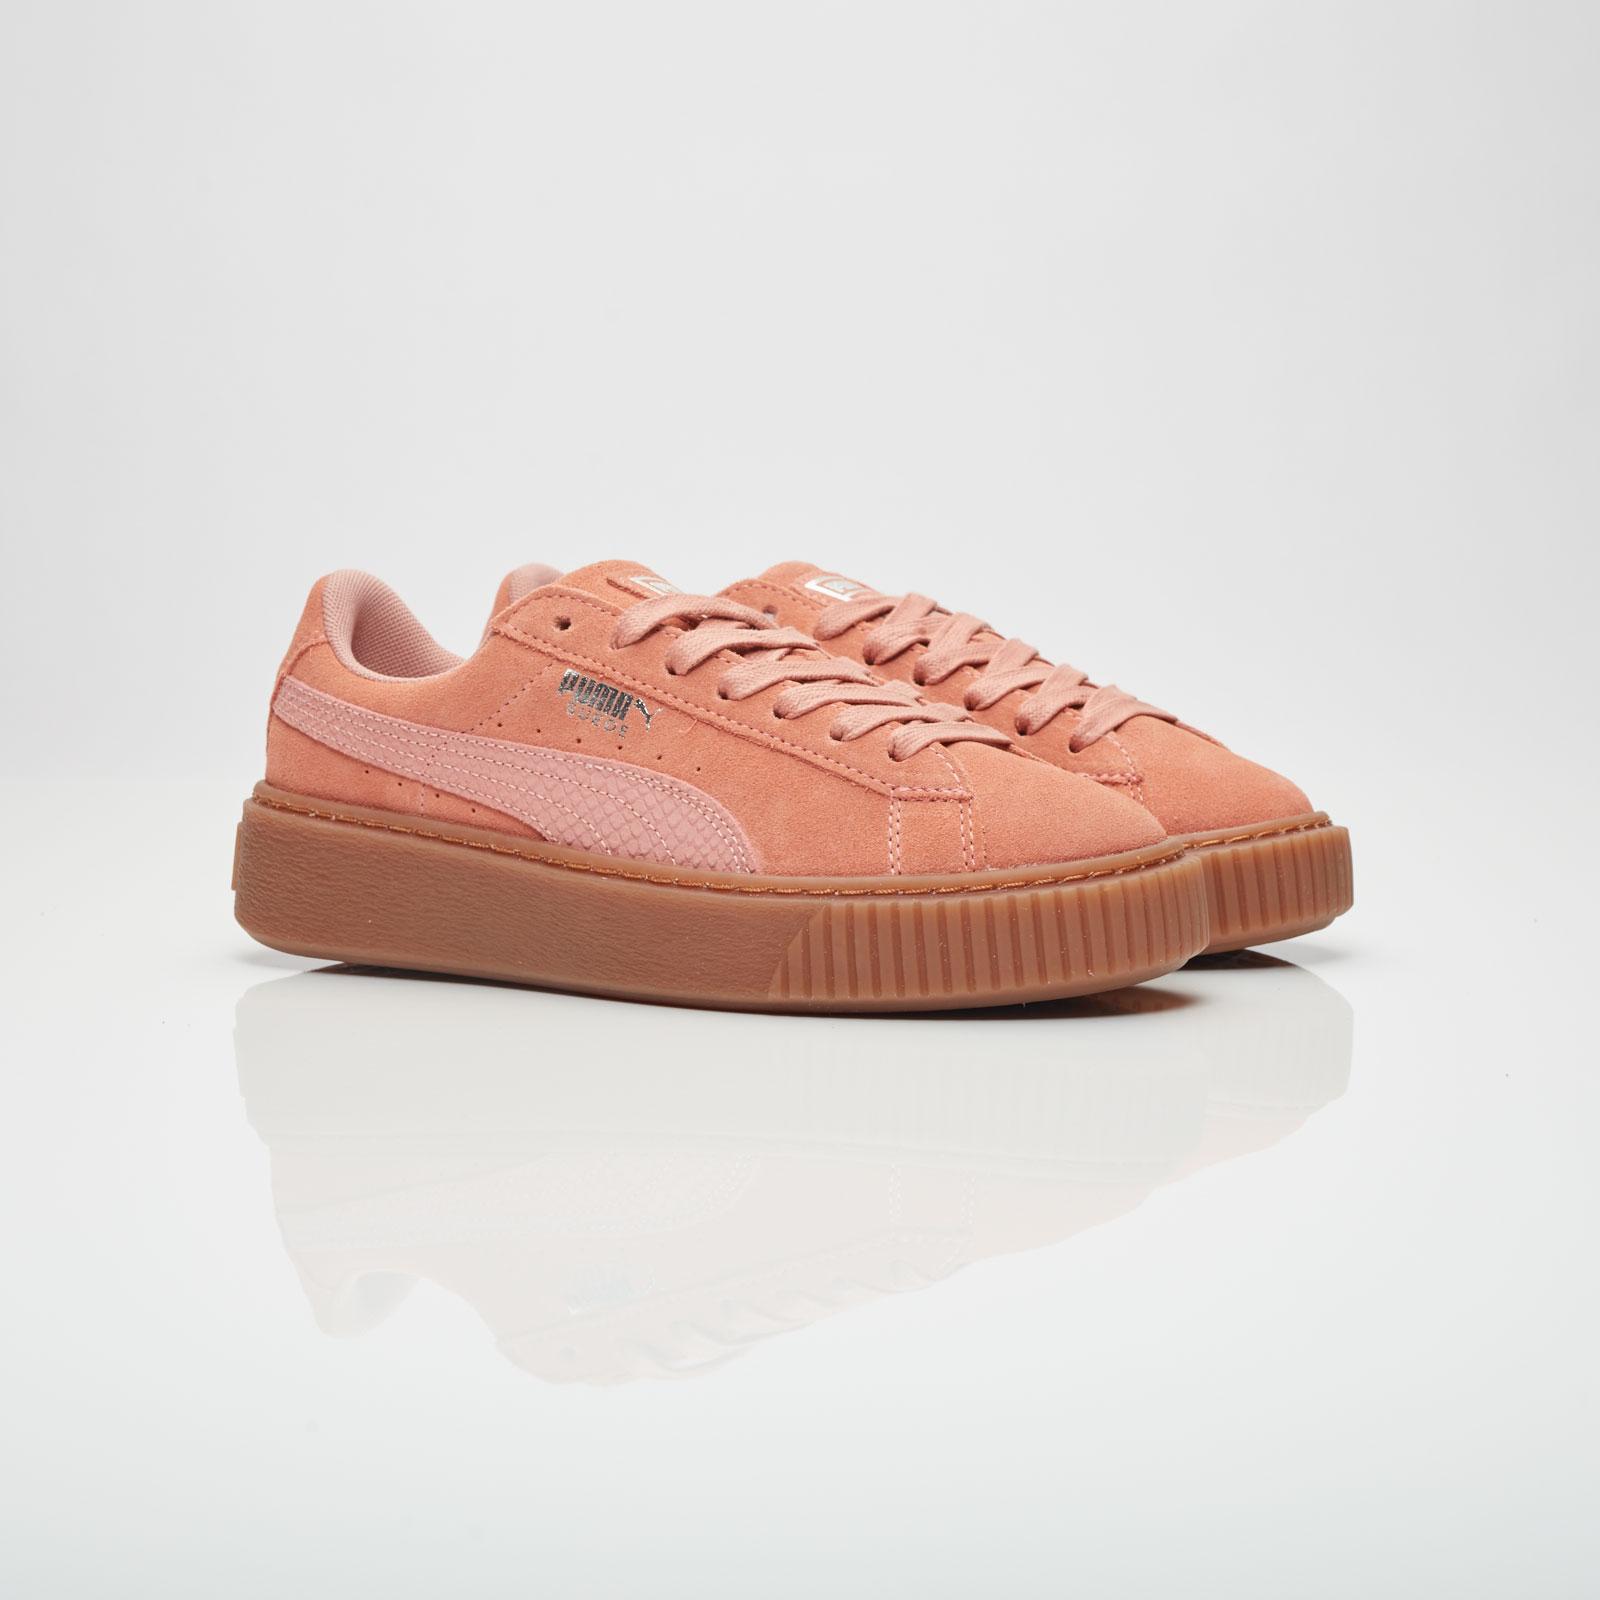 Puma Suede Platform Animal - 365109-02 - Sneakersnstuff ...